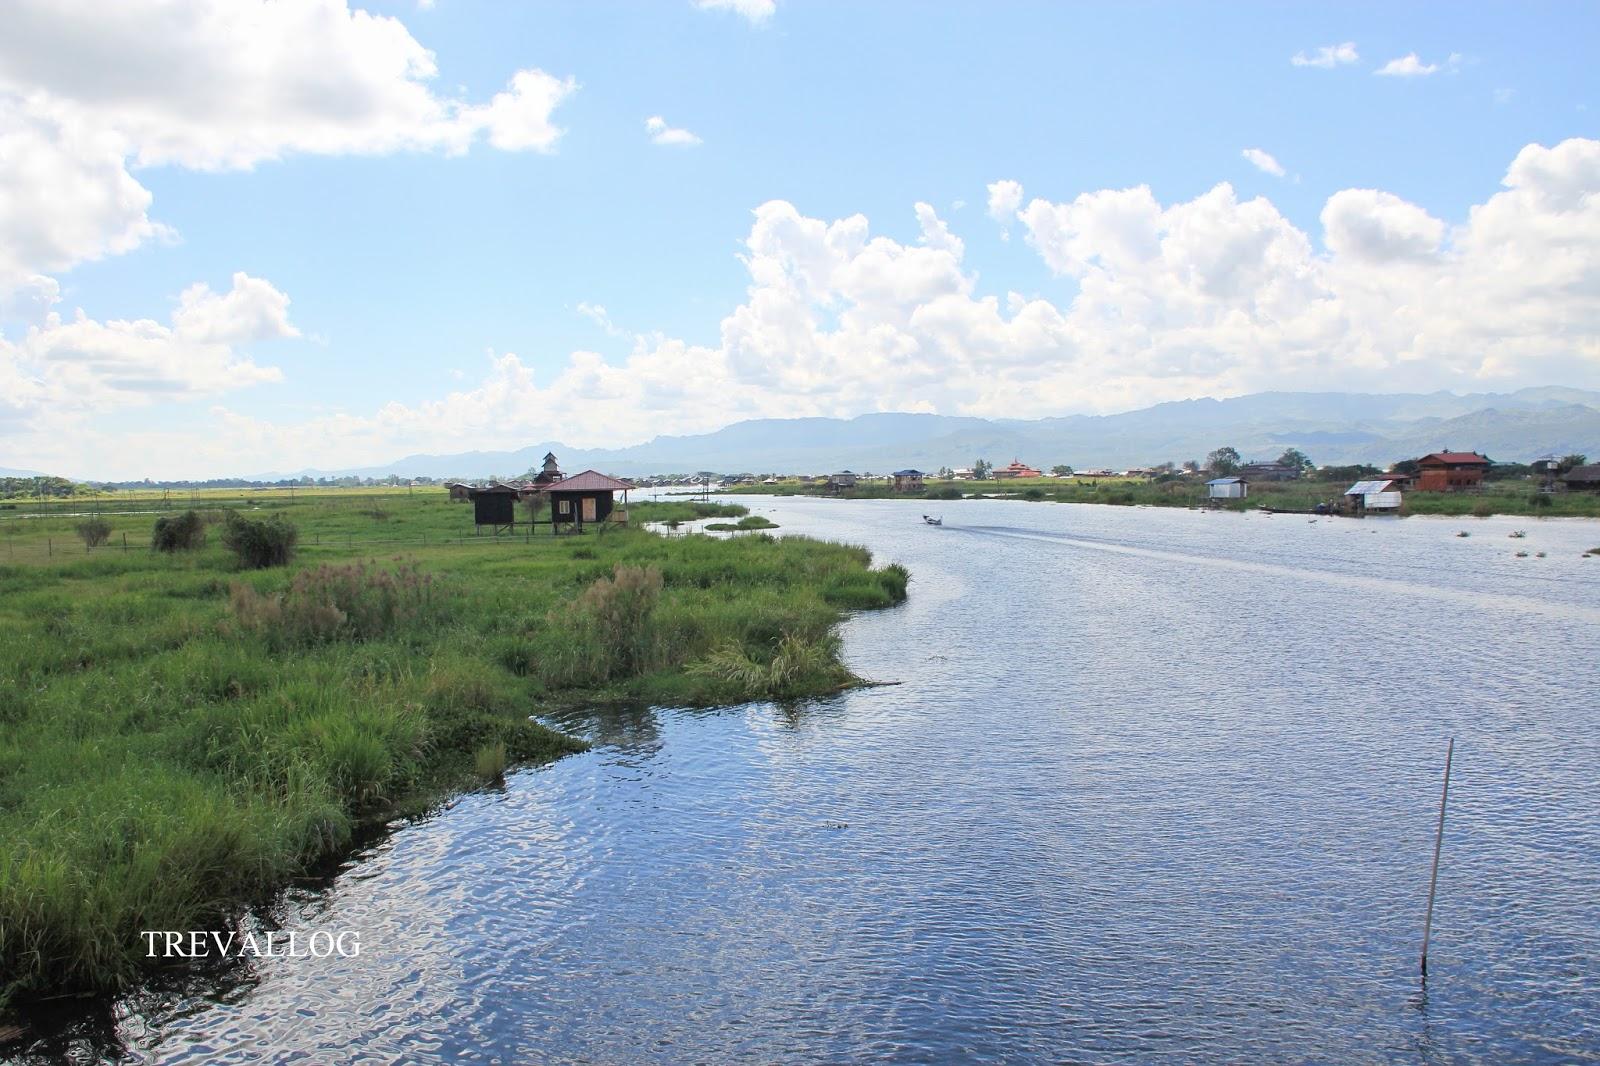 View from Nice restaurant, Inle Lake, Myanmar